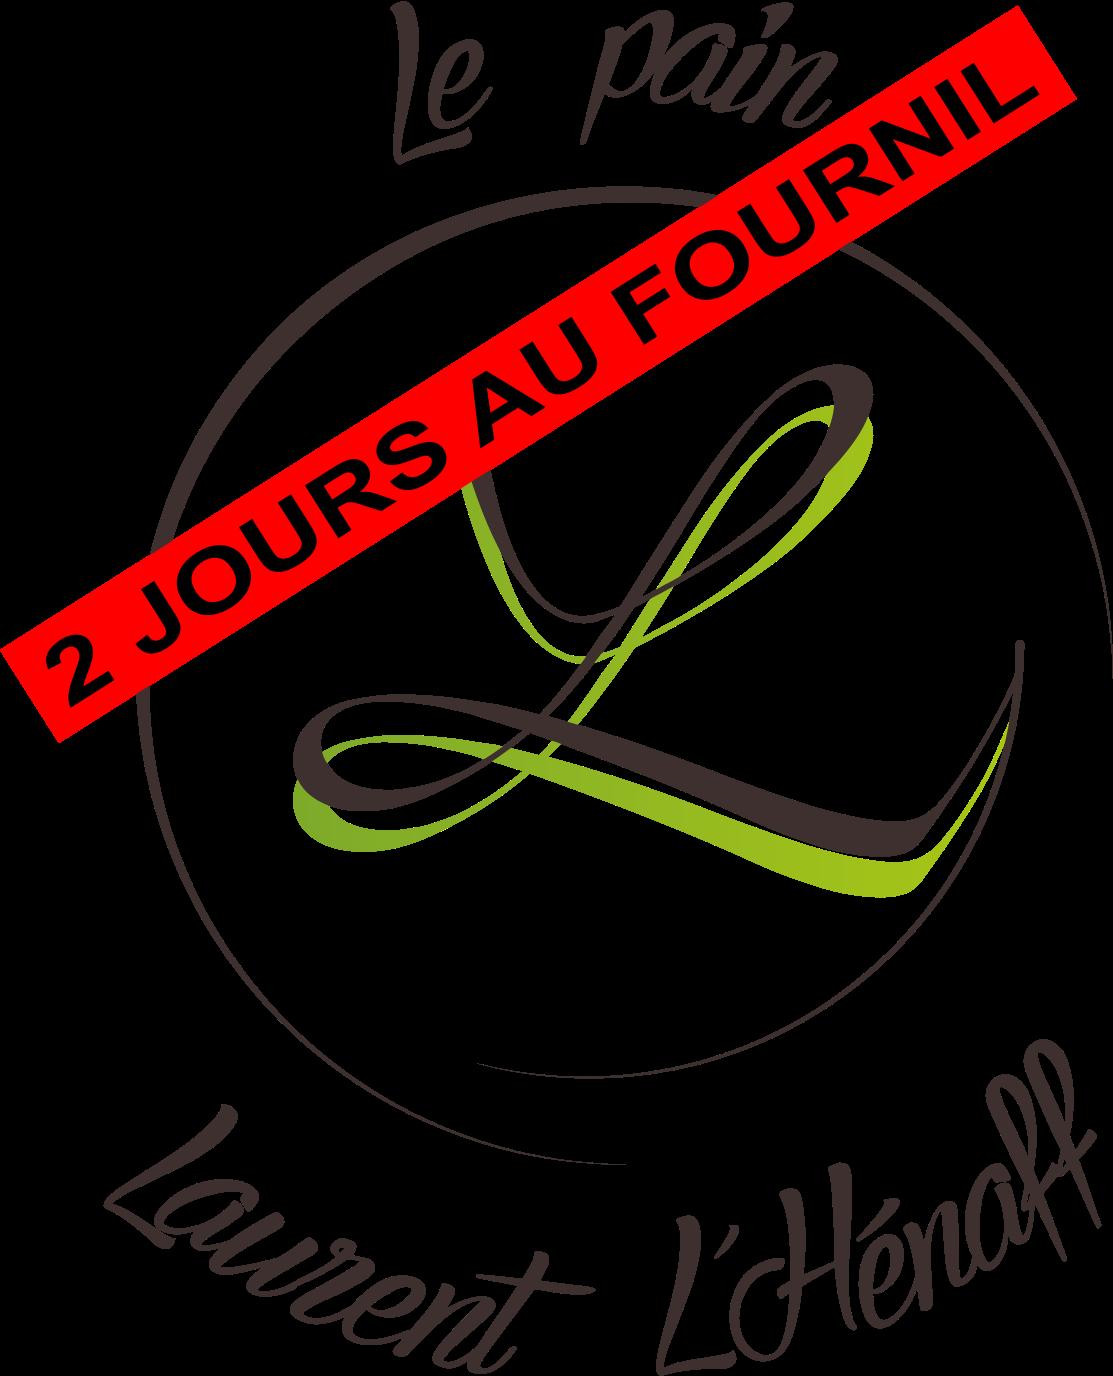 Logo_Le_Pain_Laurent_L_he_naff_2j_fournil-1495063290.png